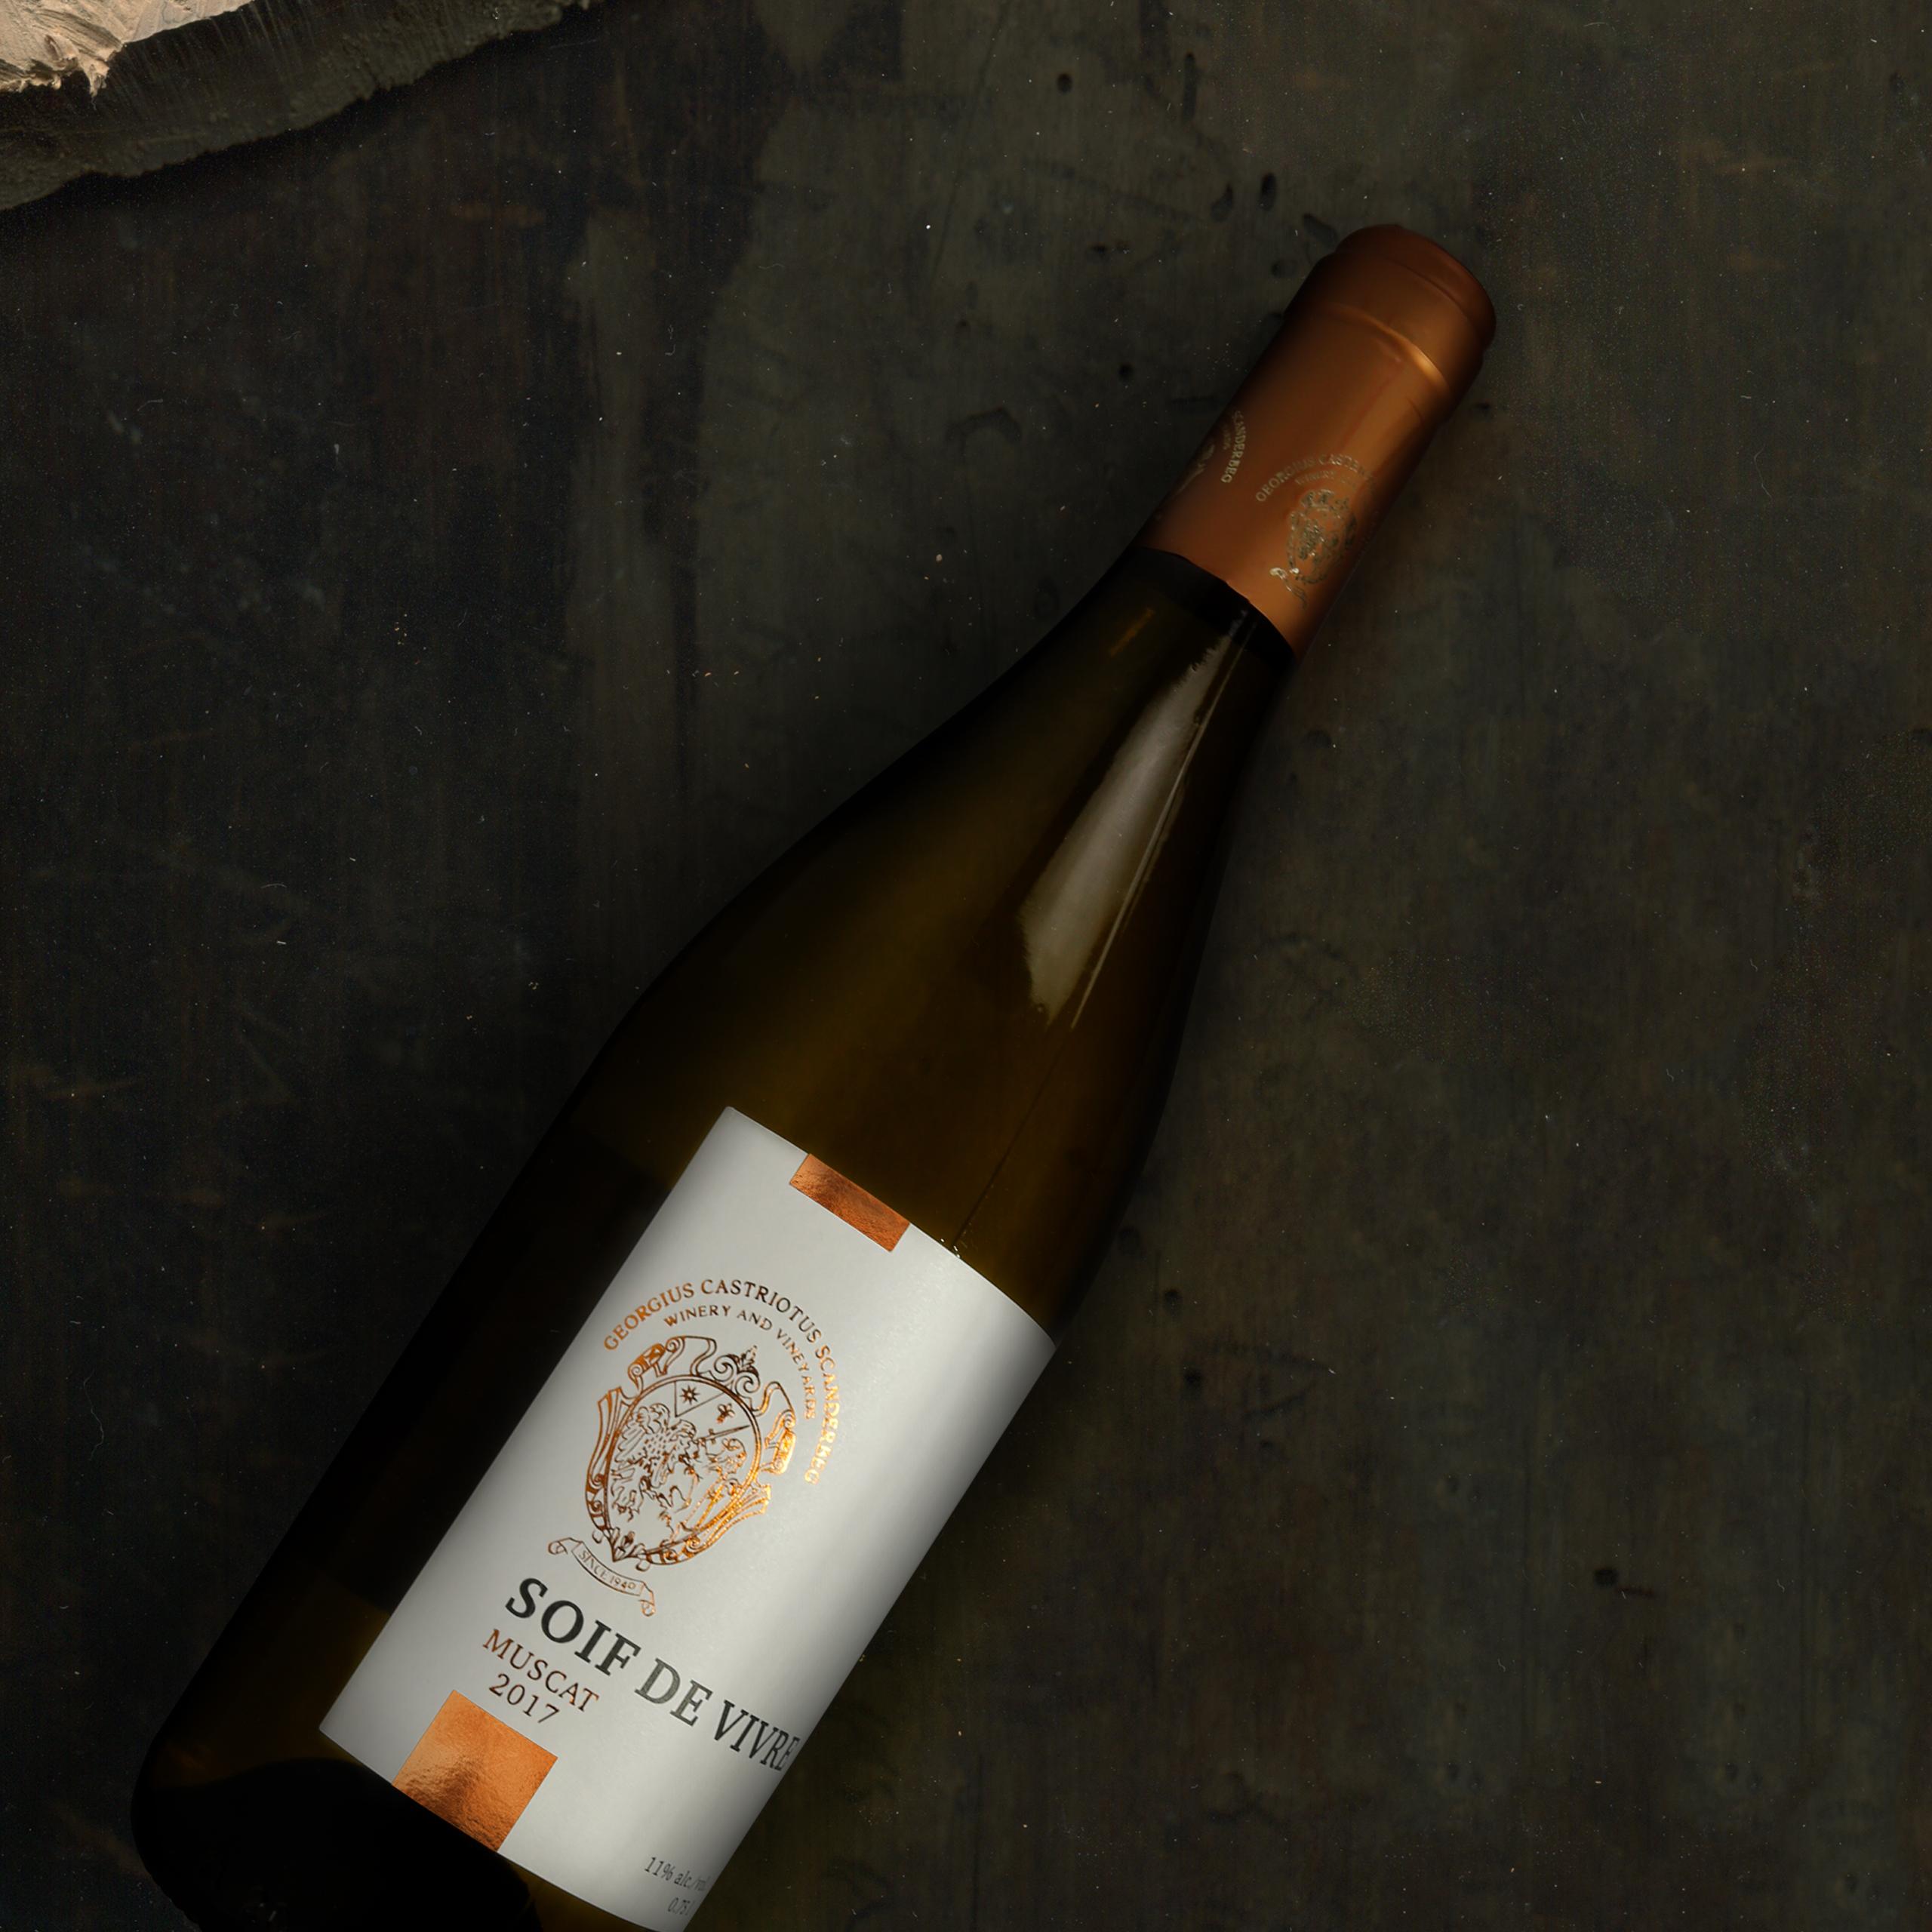 Kantina Skënderbeu, Wine, Project Img 12 - Vatra Agency / Founder & CEO Gerton Bejo